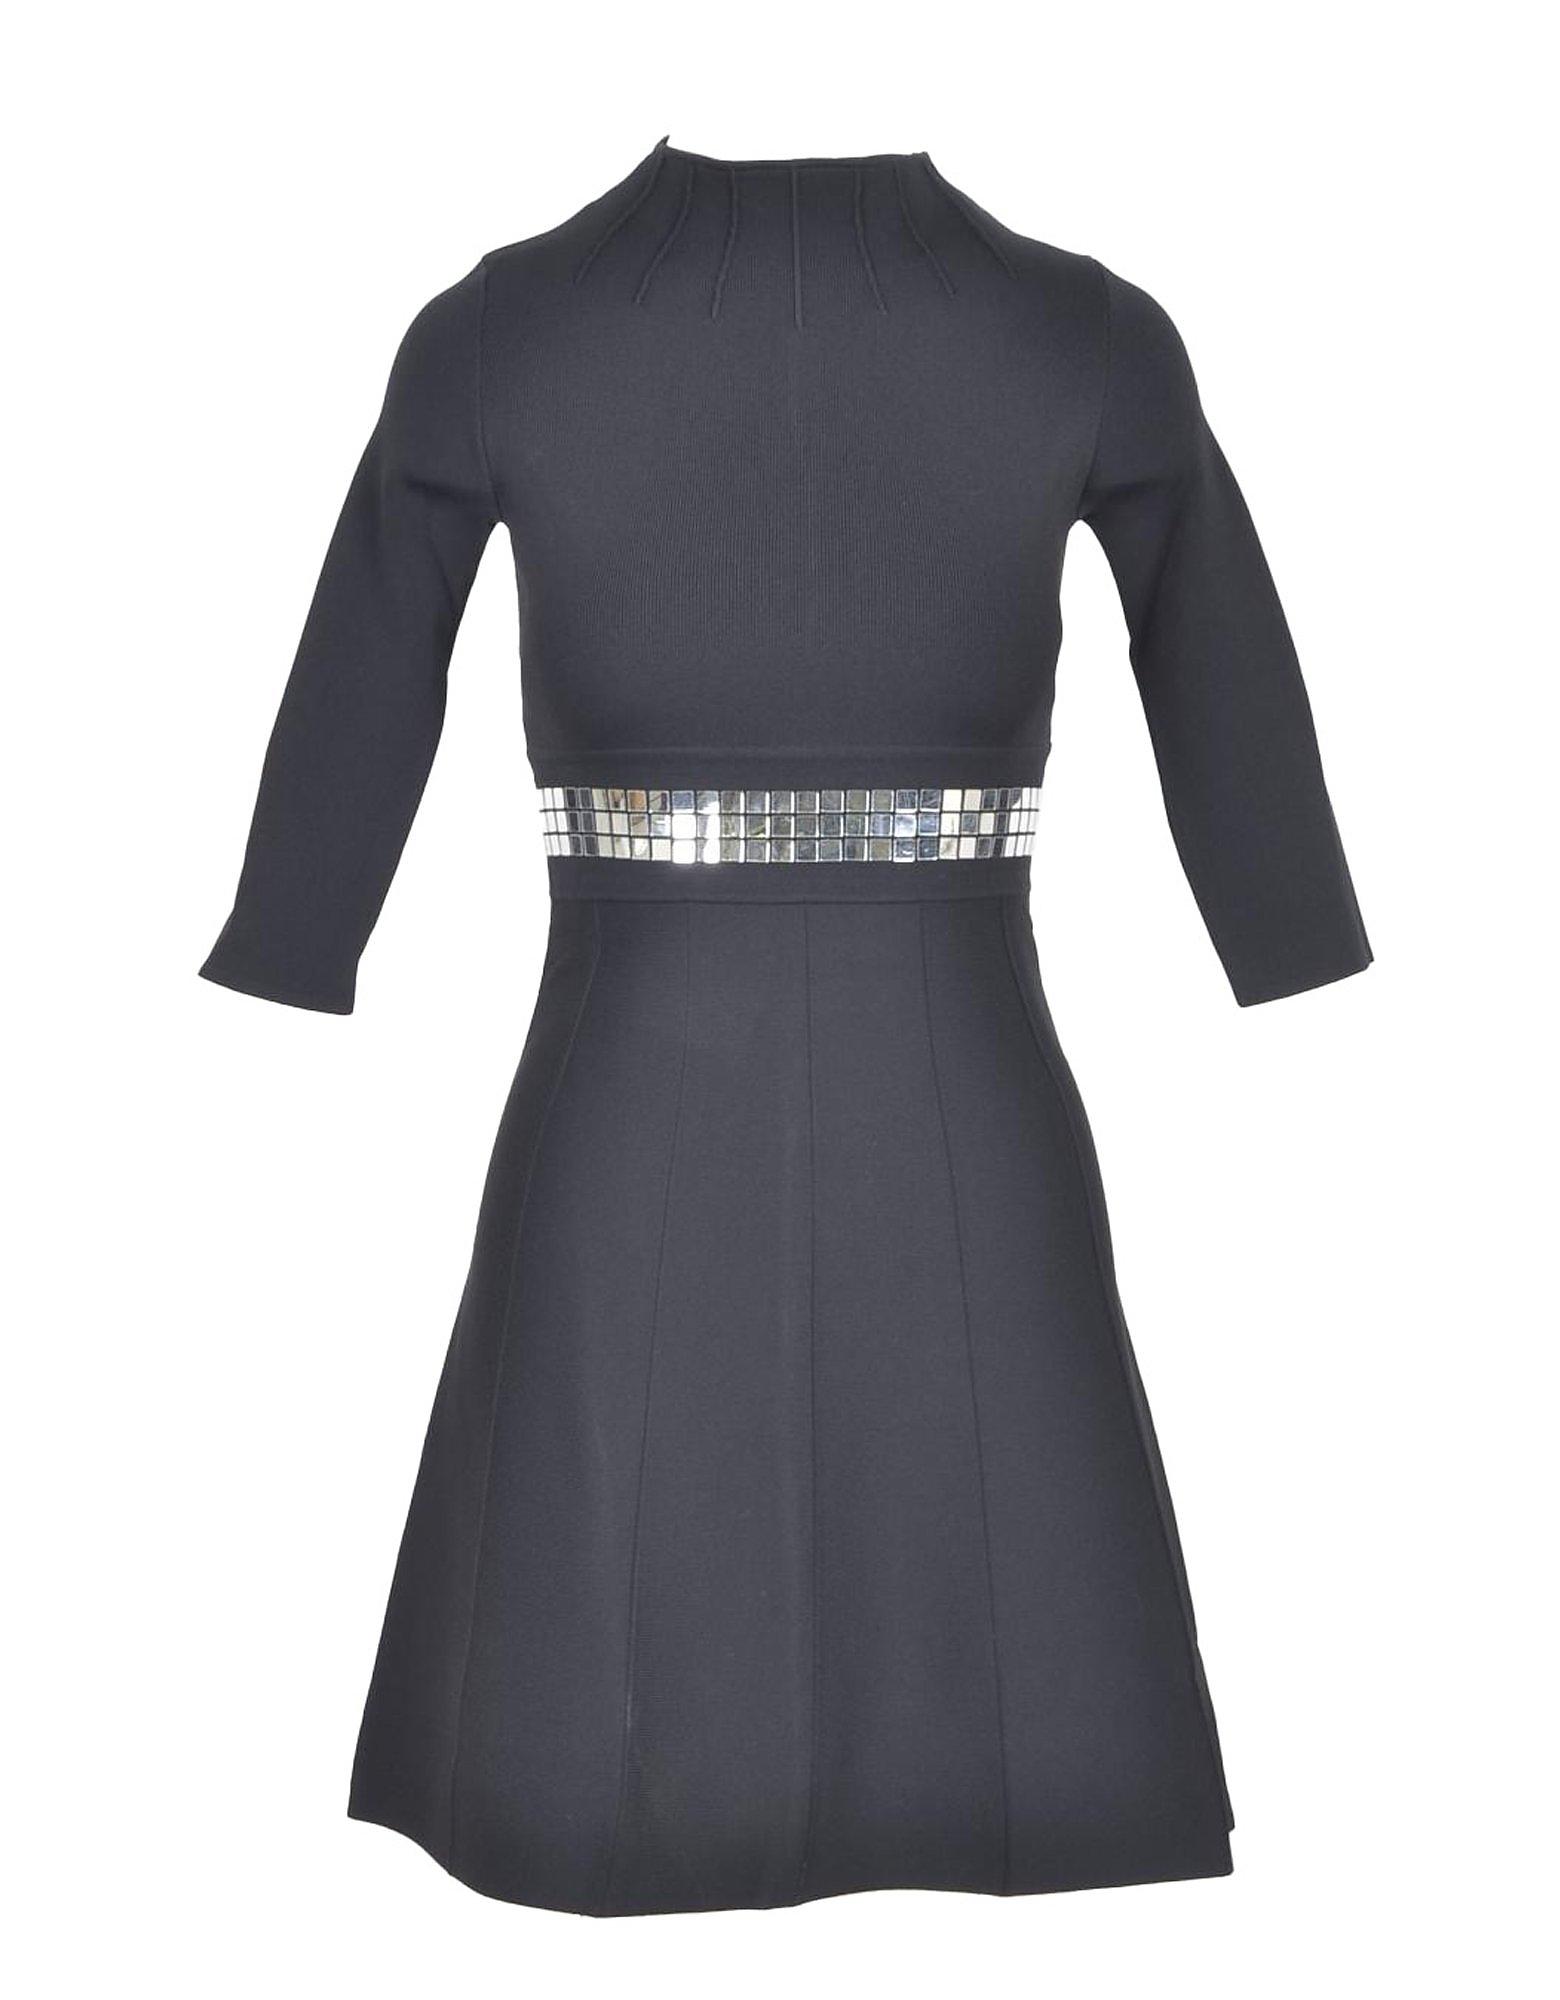 Pinko Designer Dresses & Jumpsuits, Black Viscose Blend Women's Dress with 3/4 Sleeve